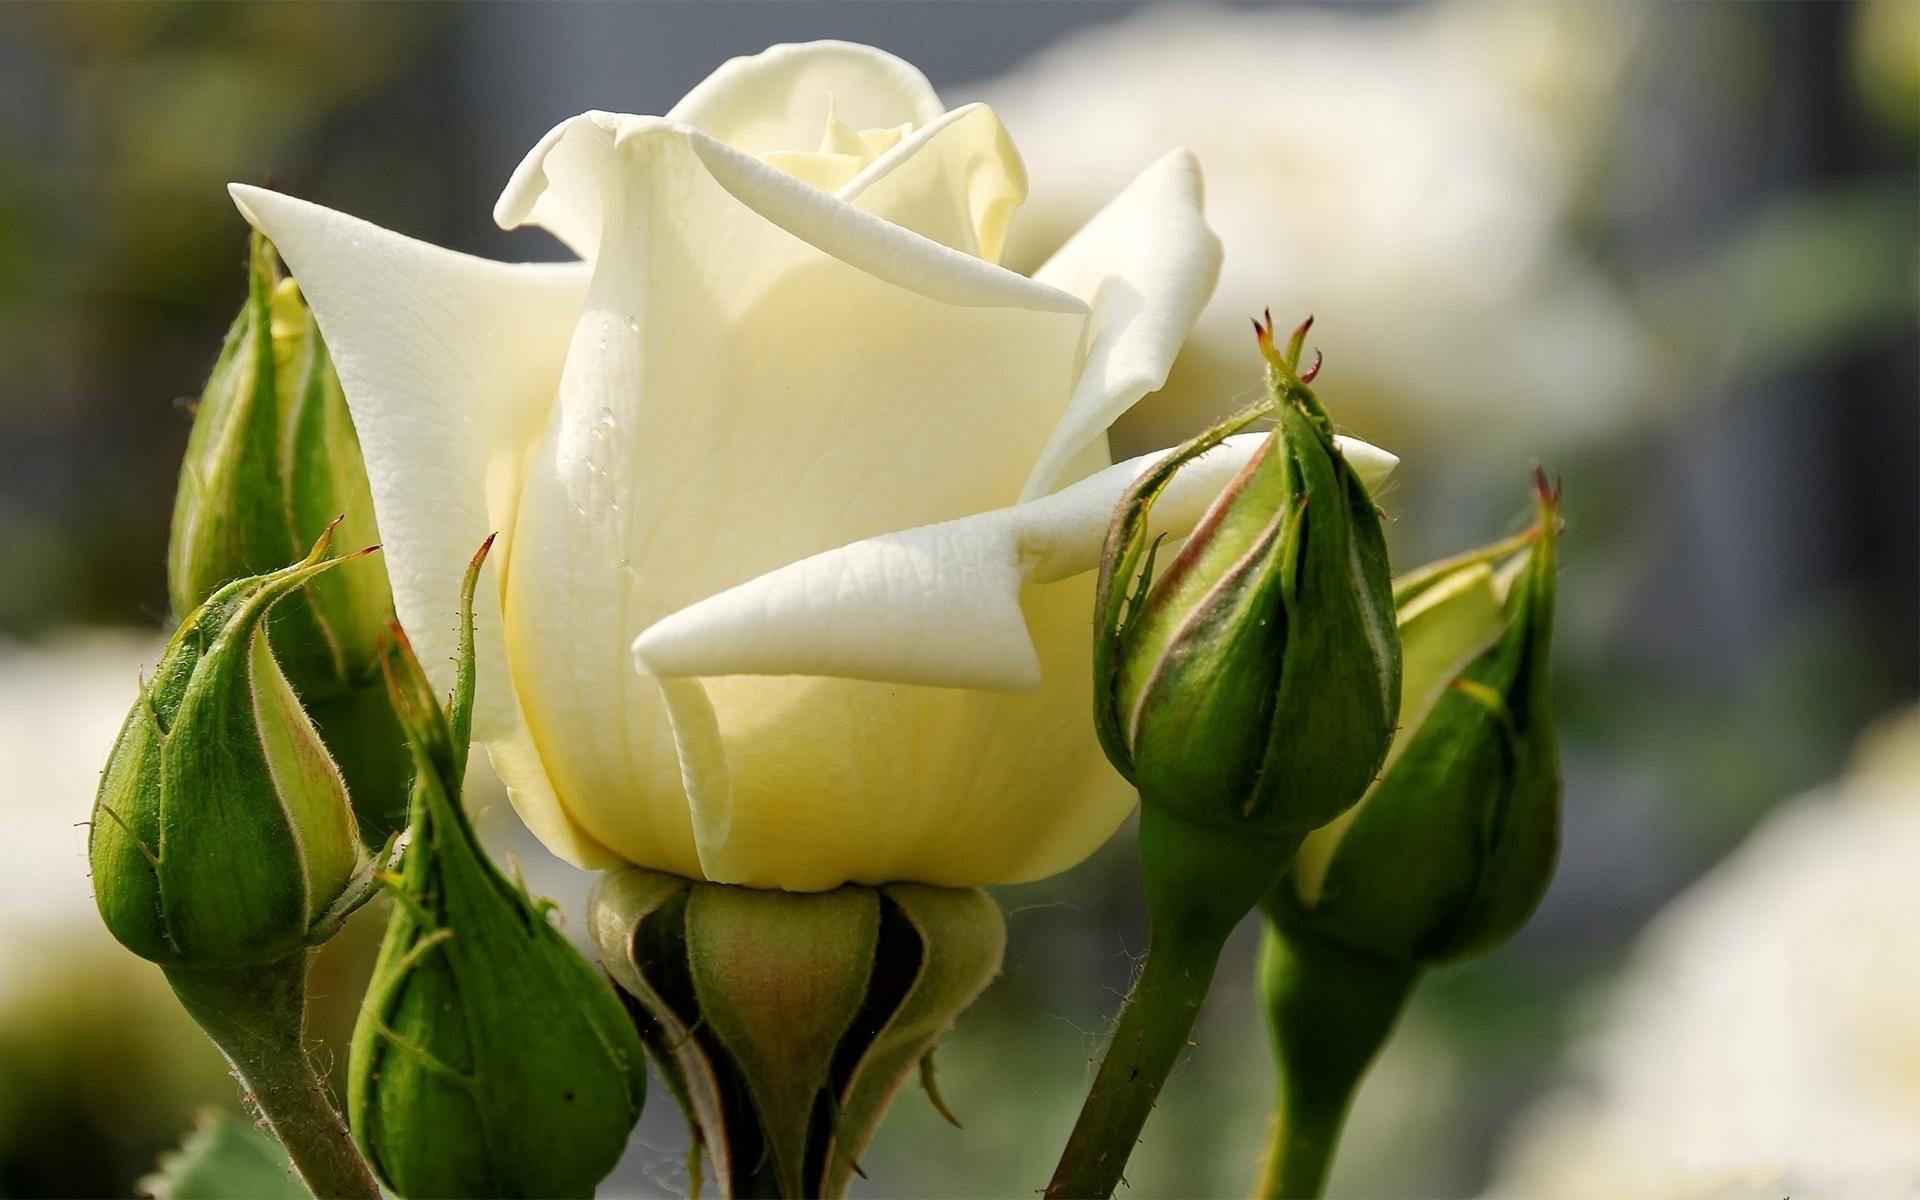 очень картинка белы бутон розы фотографии